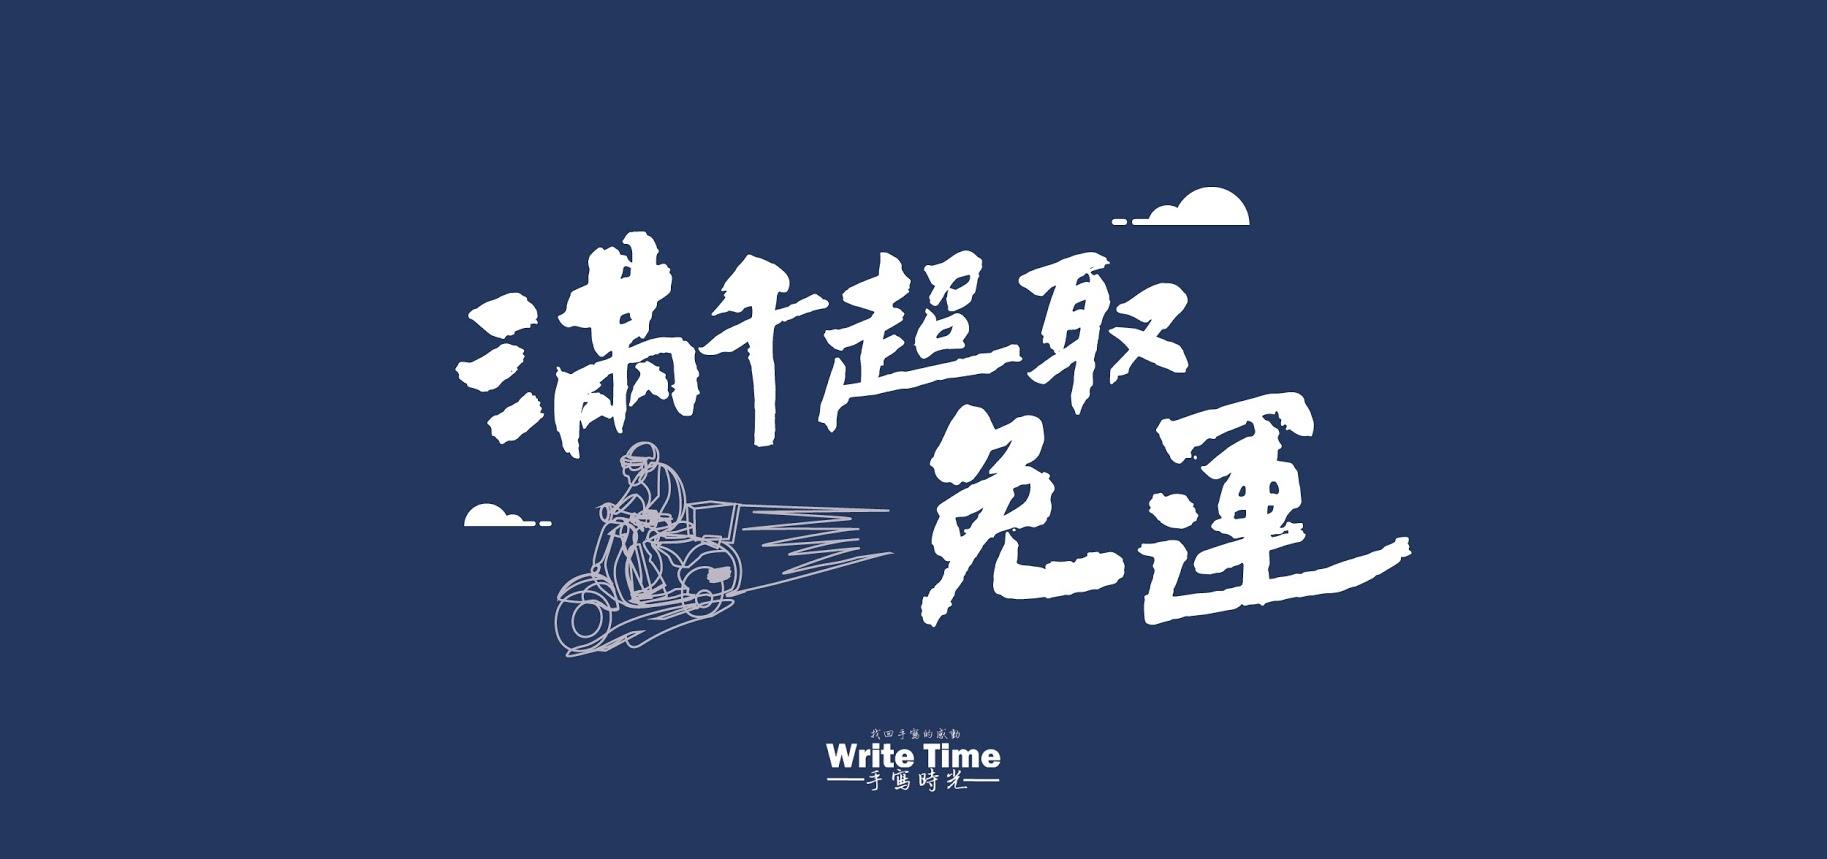 Write Time手寫時光 葉曄,夜夜寫字,SKB,原子筆,鋼筆,金曲獎,寫字達人,硬筆字,用平價筆寫出一手美字,簽名,手寫美行,葉曄書,葉曄字體,楊耕